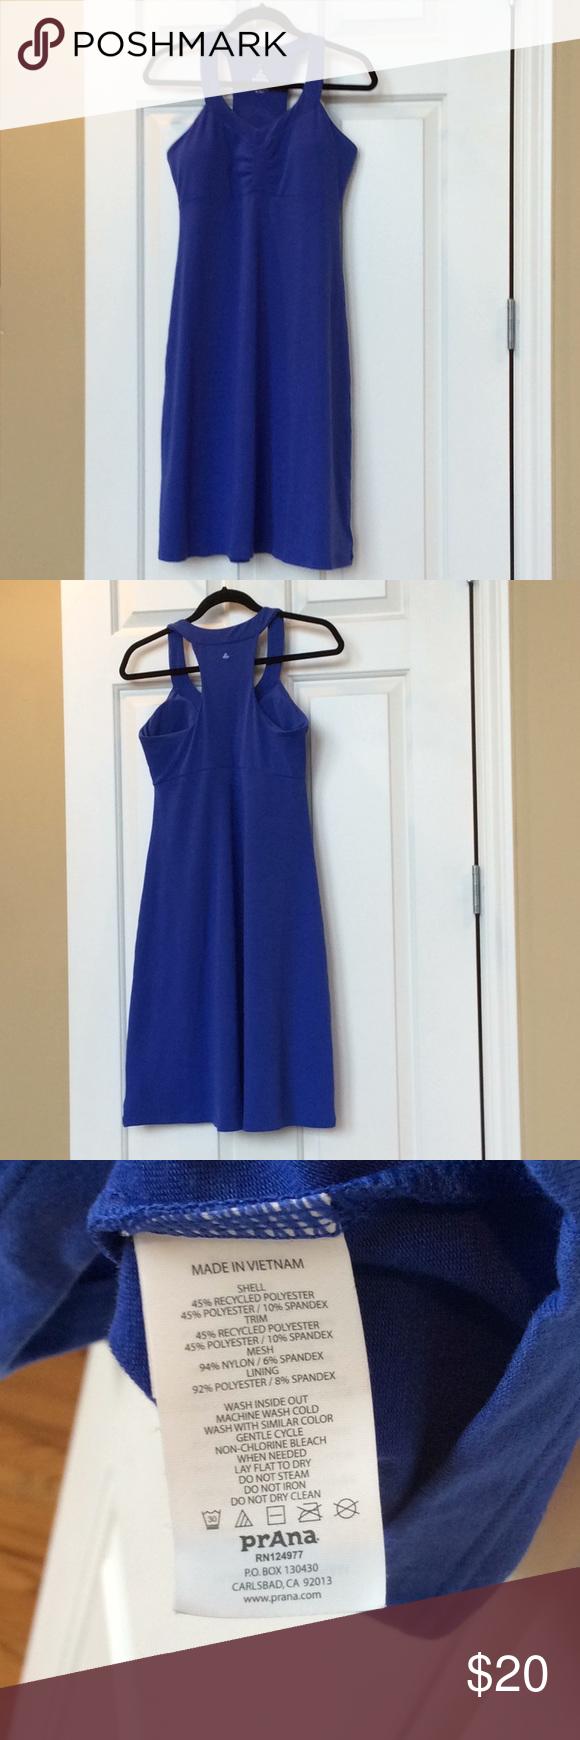 Prana Blue Summer Dress Blue Summer Dresses Summer Dresses Dresses [ 1740 x 580 Pixel ]